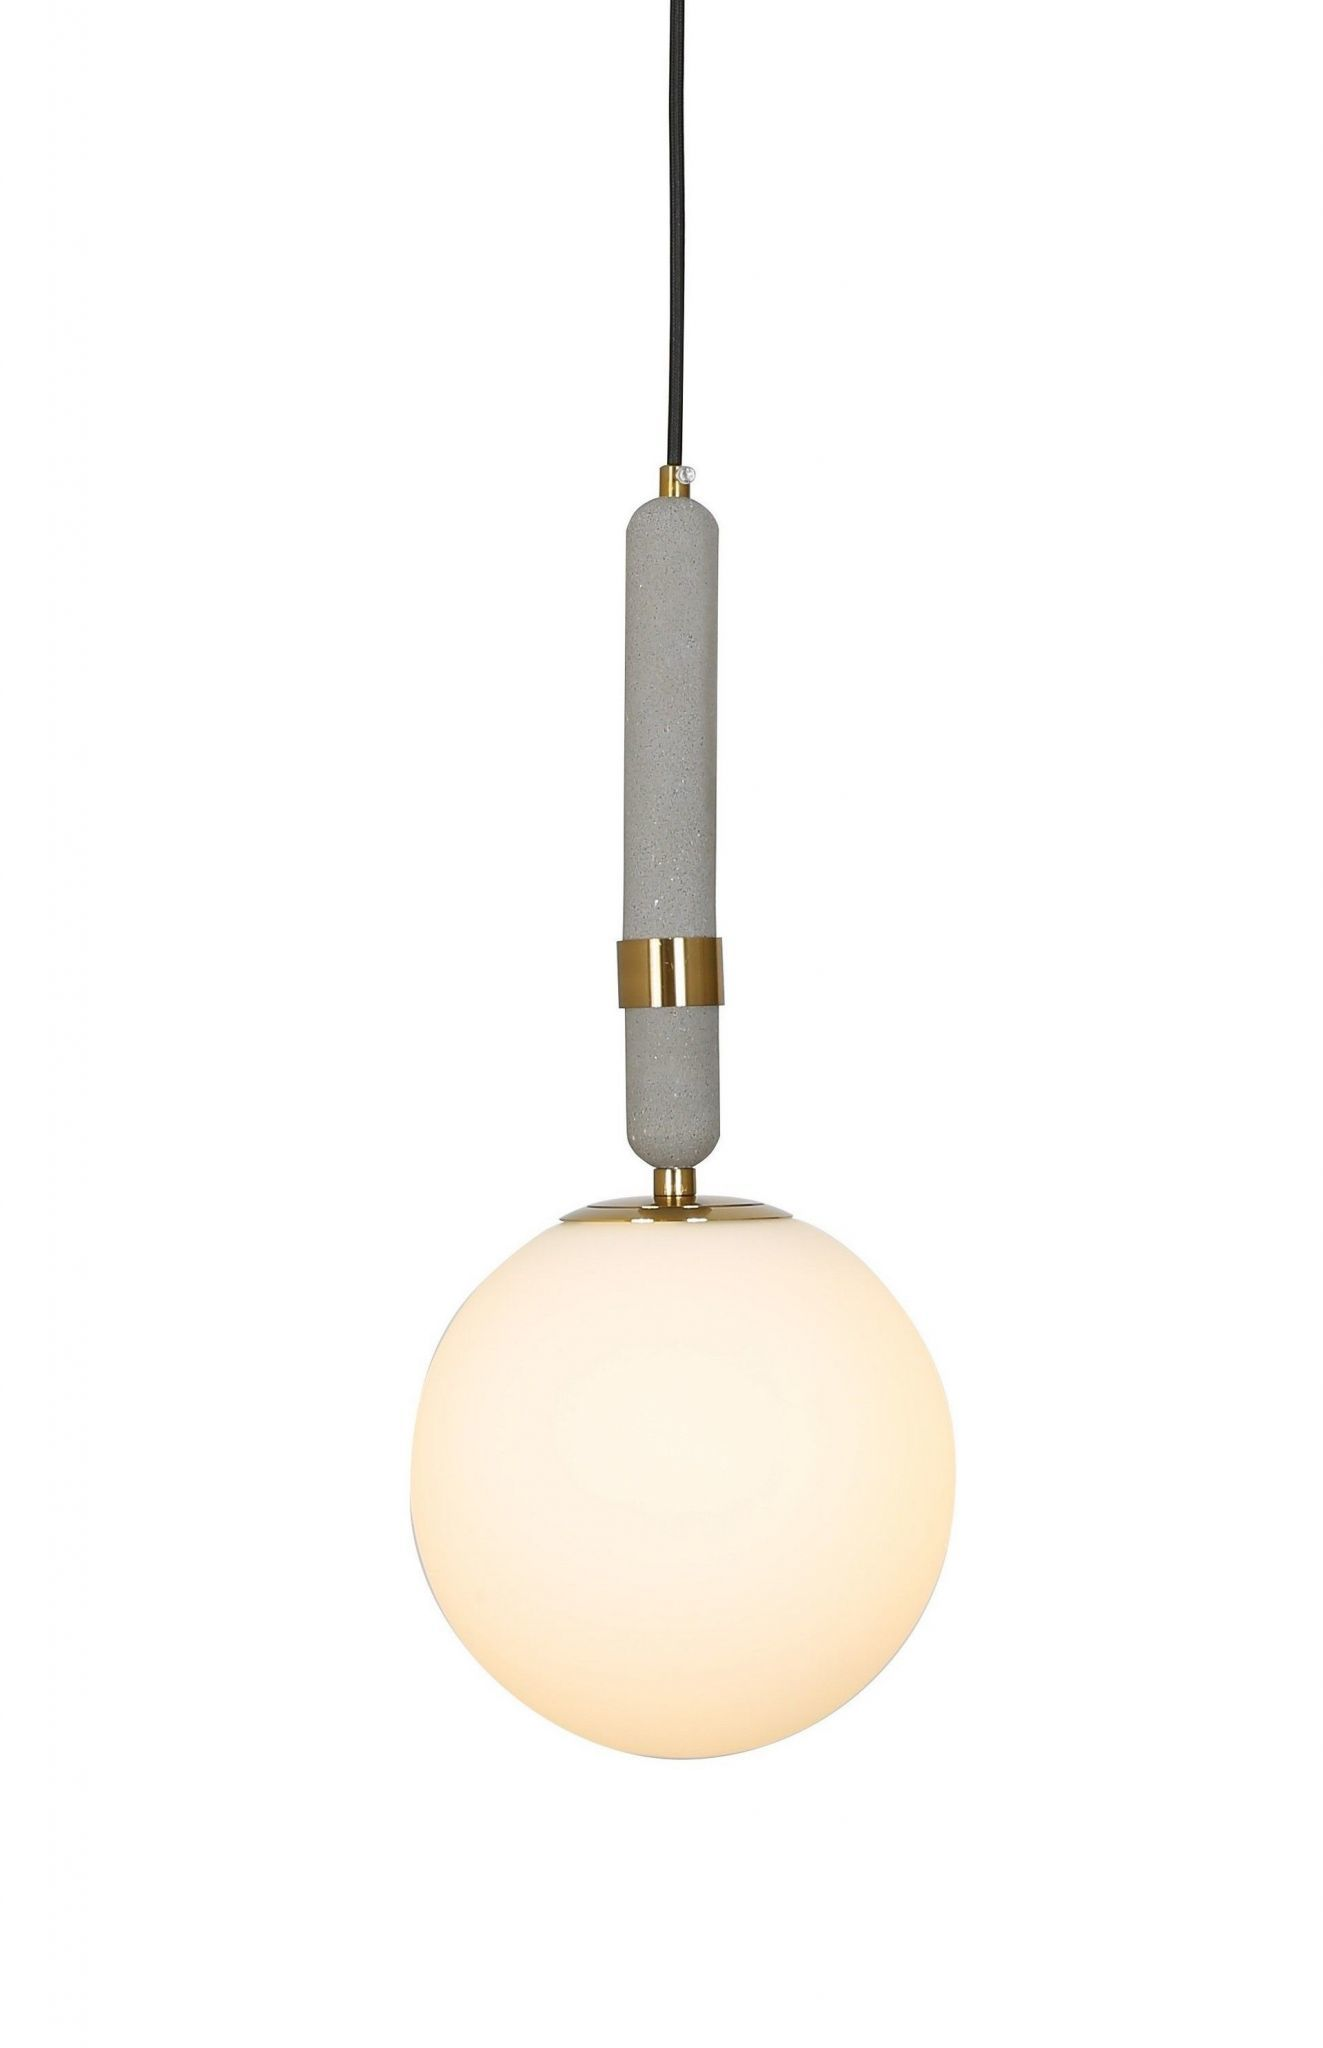 NOWOCZESNA LAMPA WISZĄCA MOSIĘŻNA GRANINO D20